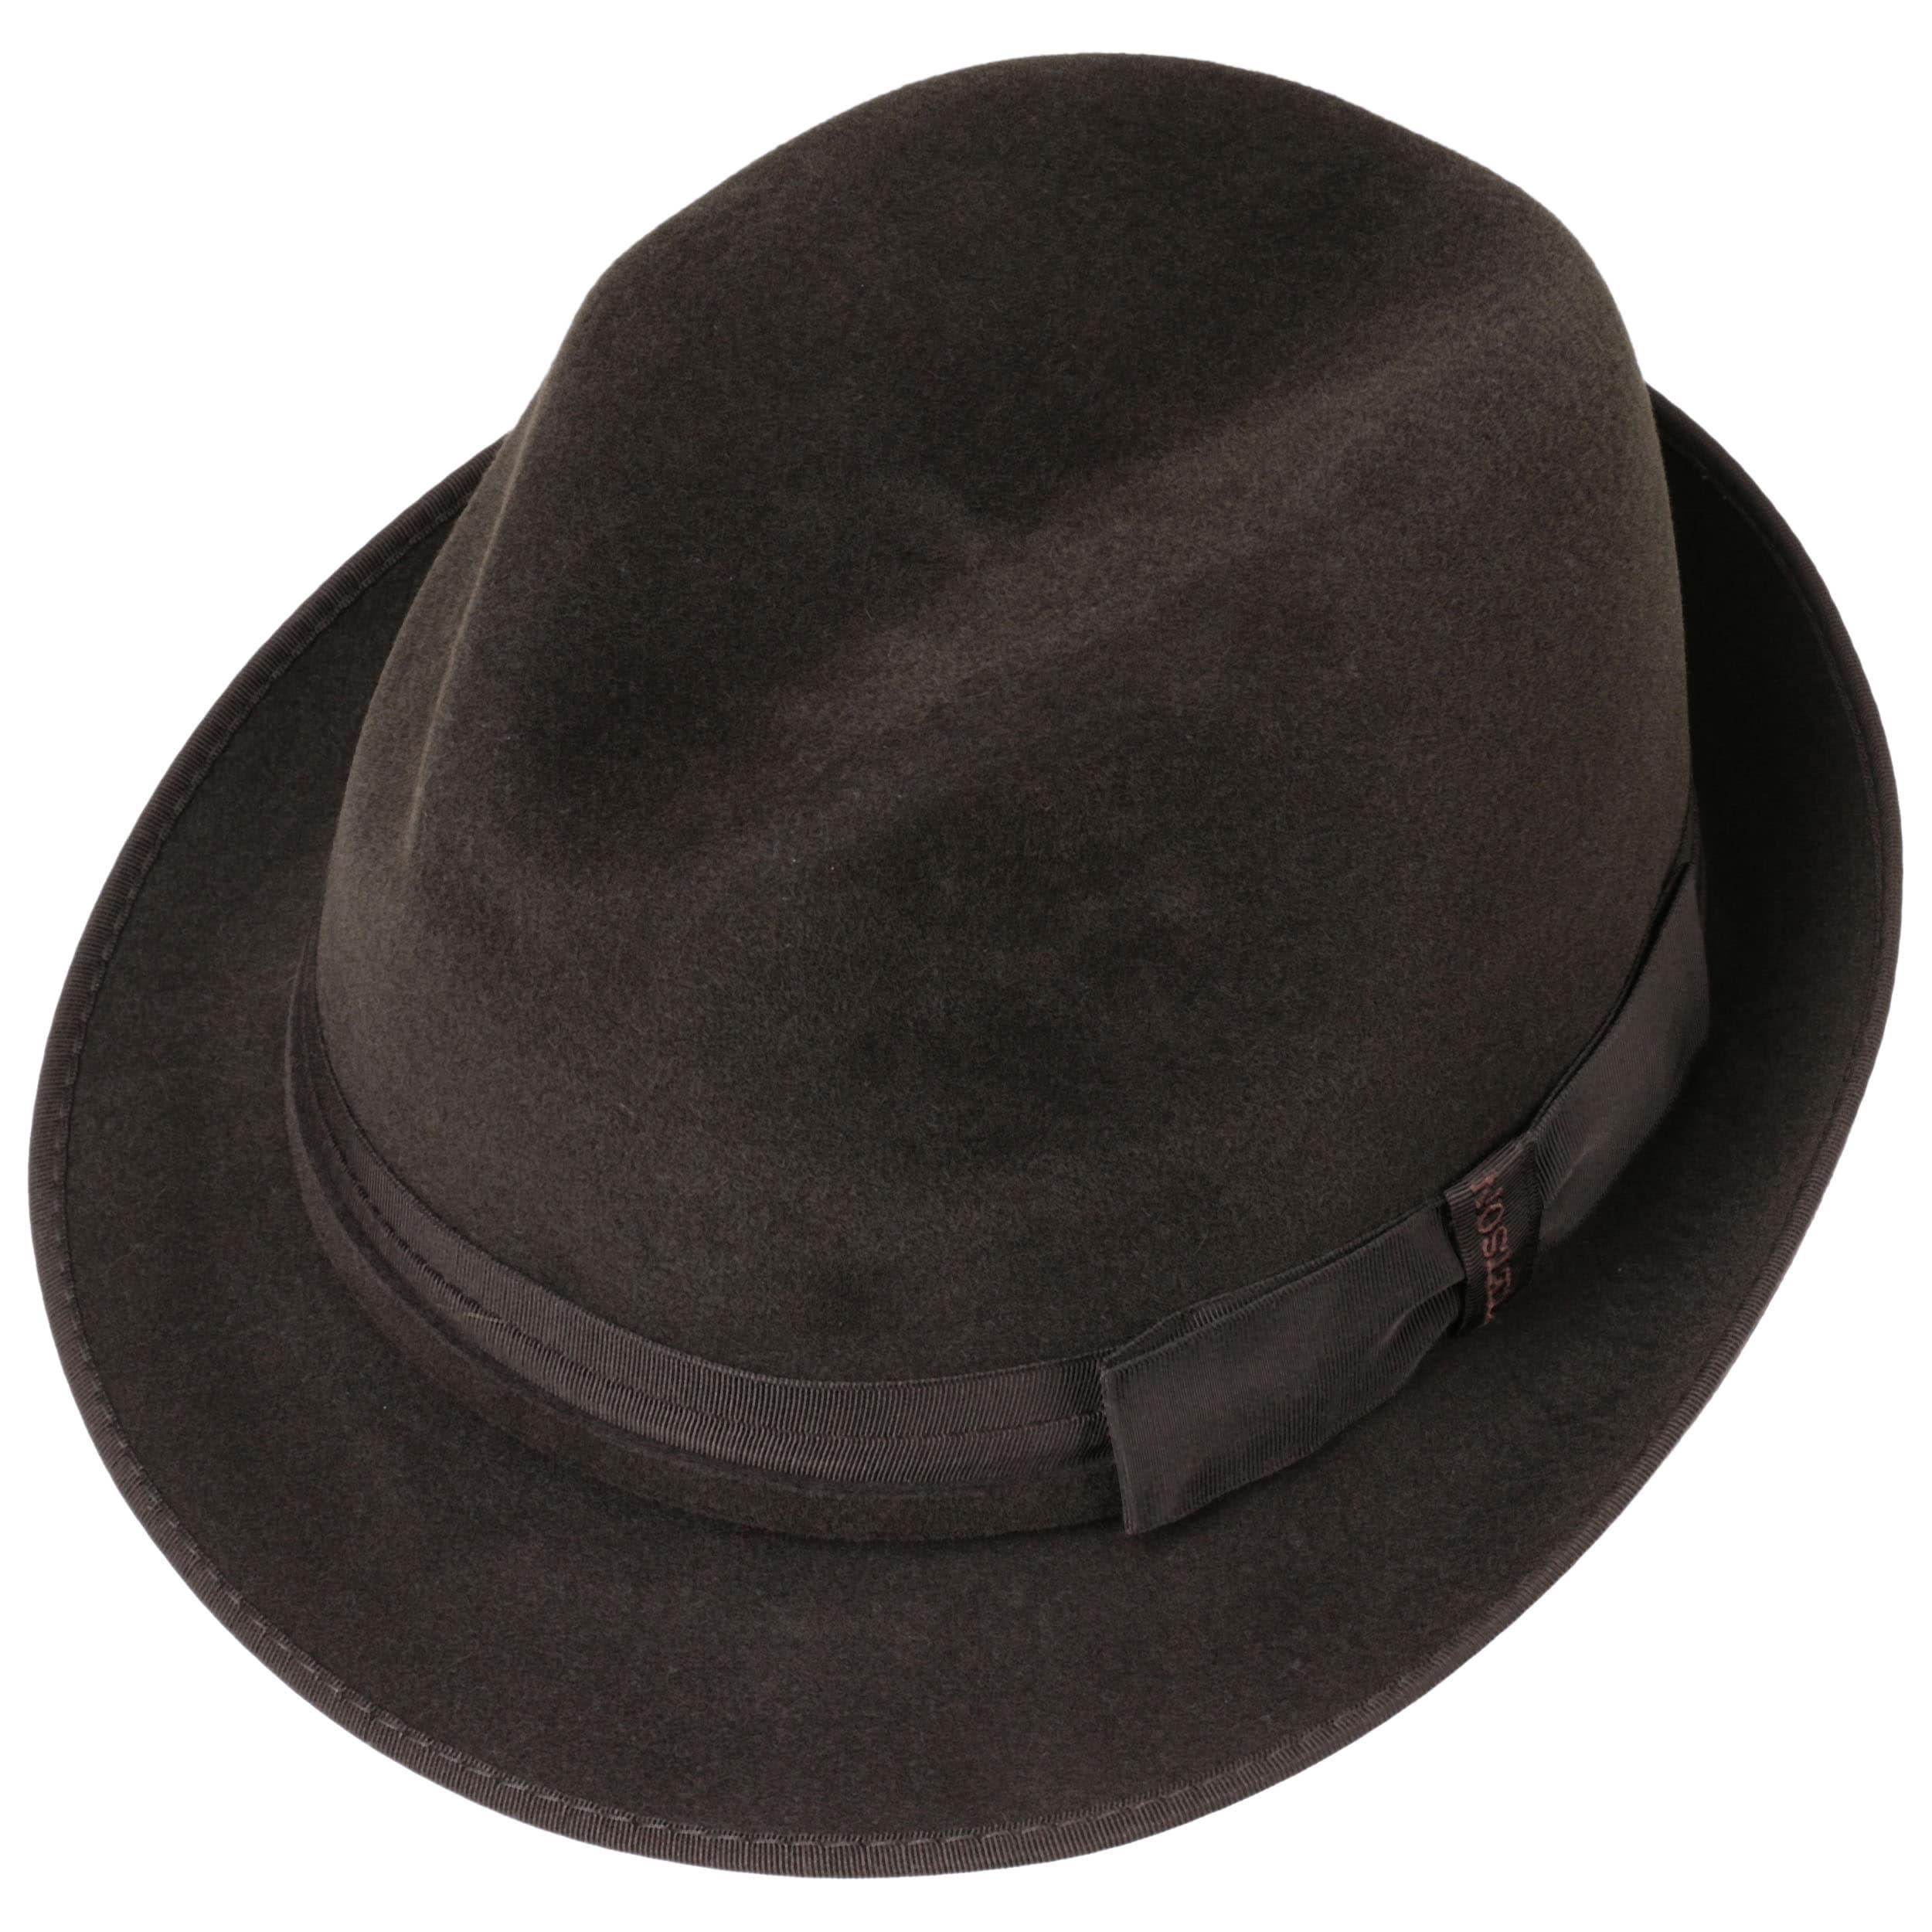 Tobi Velours Fur Felt Hat by Stetson Trilby hats Stetson MaqZ0JQIdj